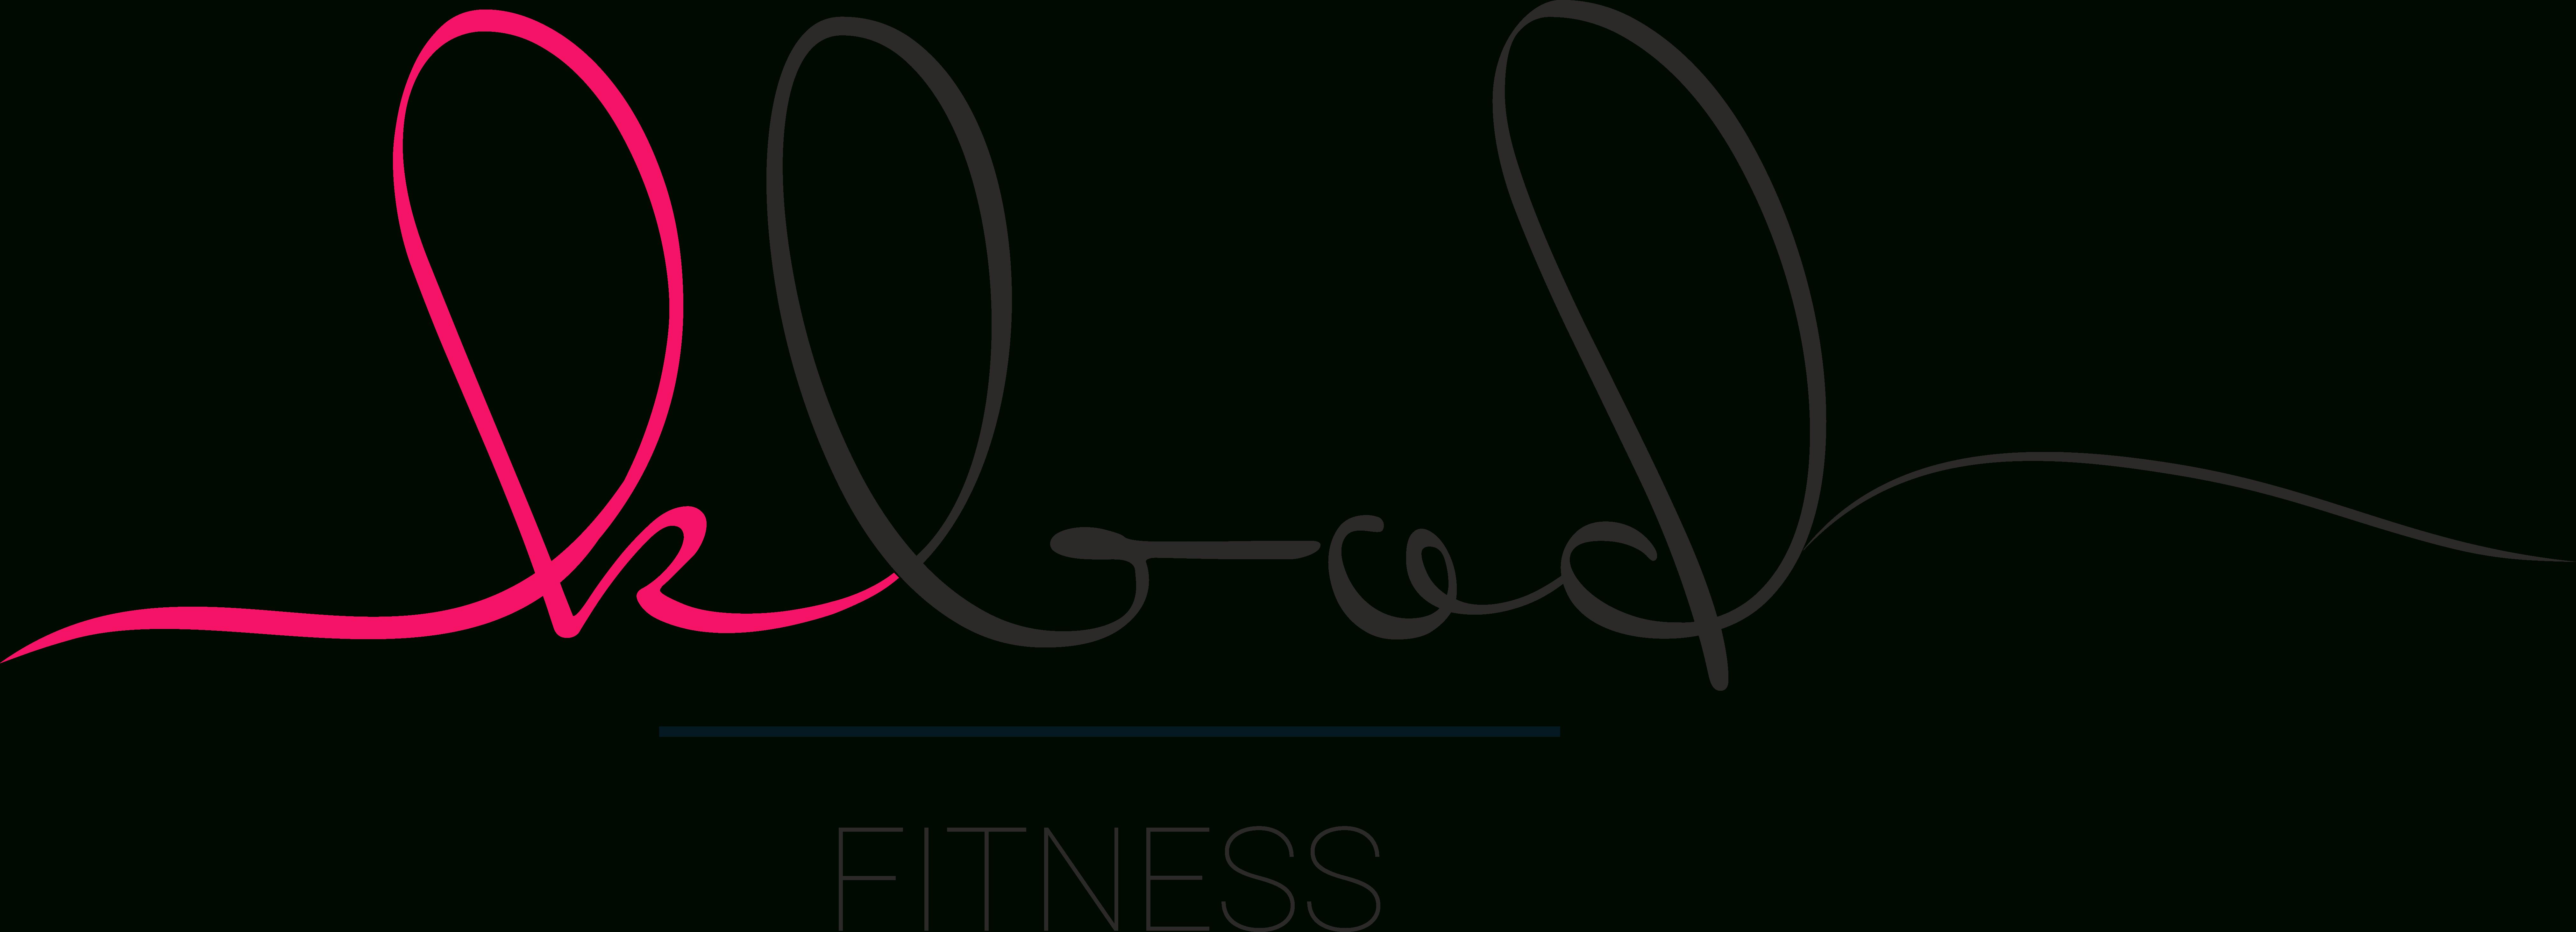 2 Cursive Logo_Kbod_Black - Kbod Fitness